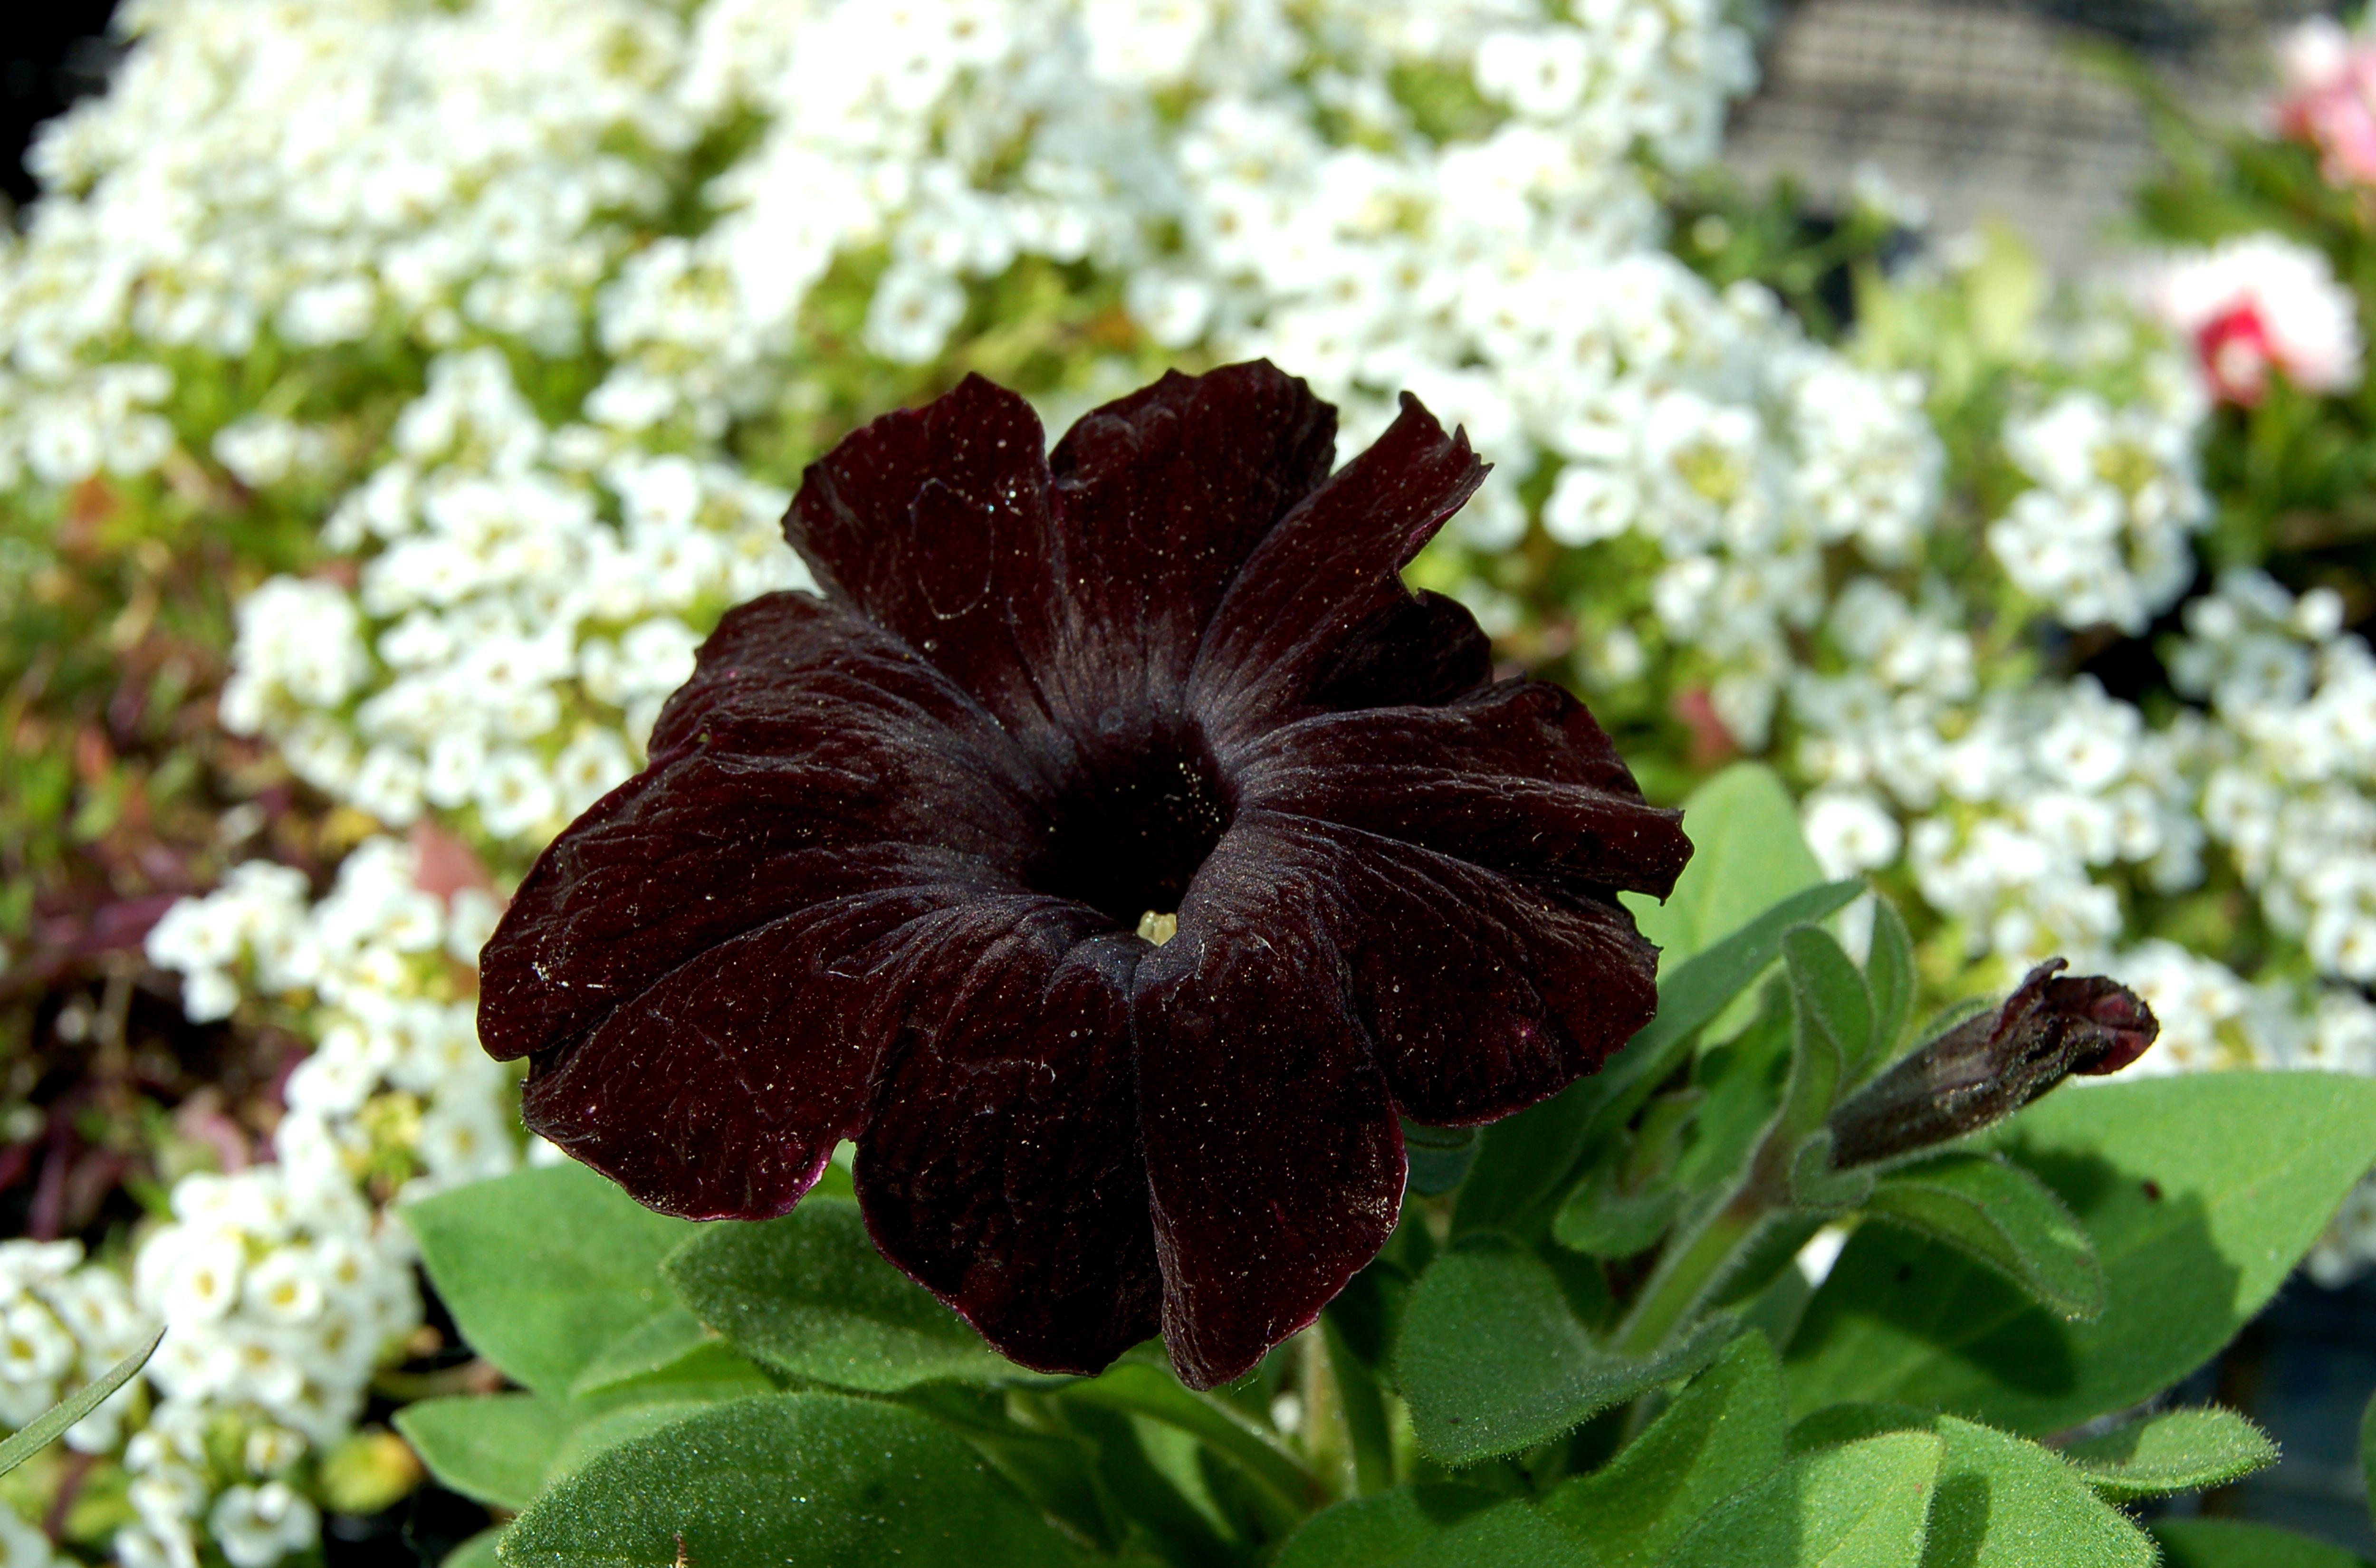 Pictures of black flowers izmirmasajfo